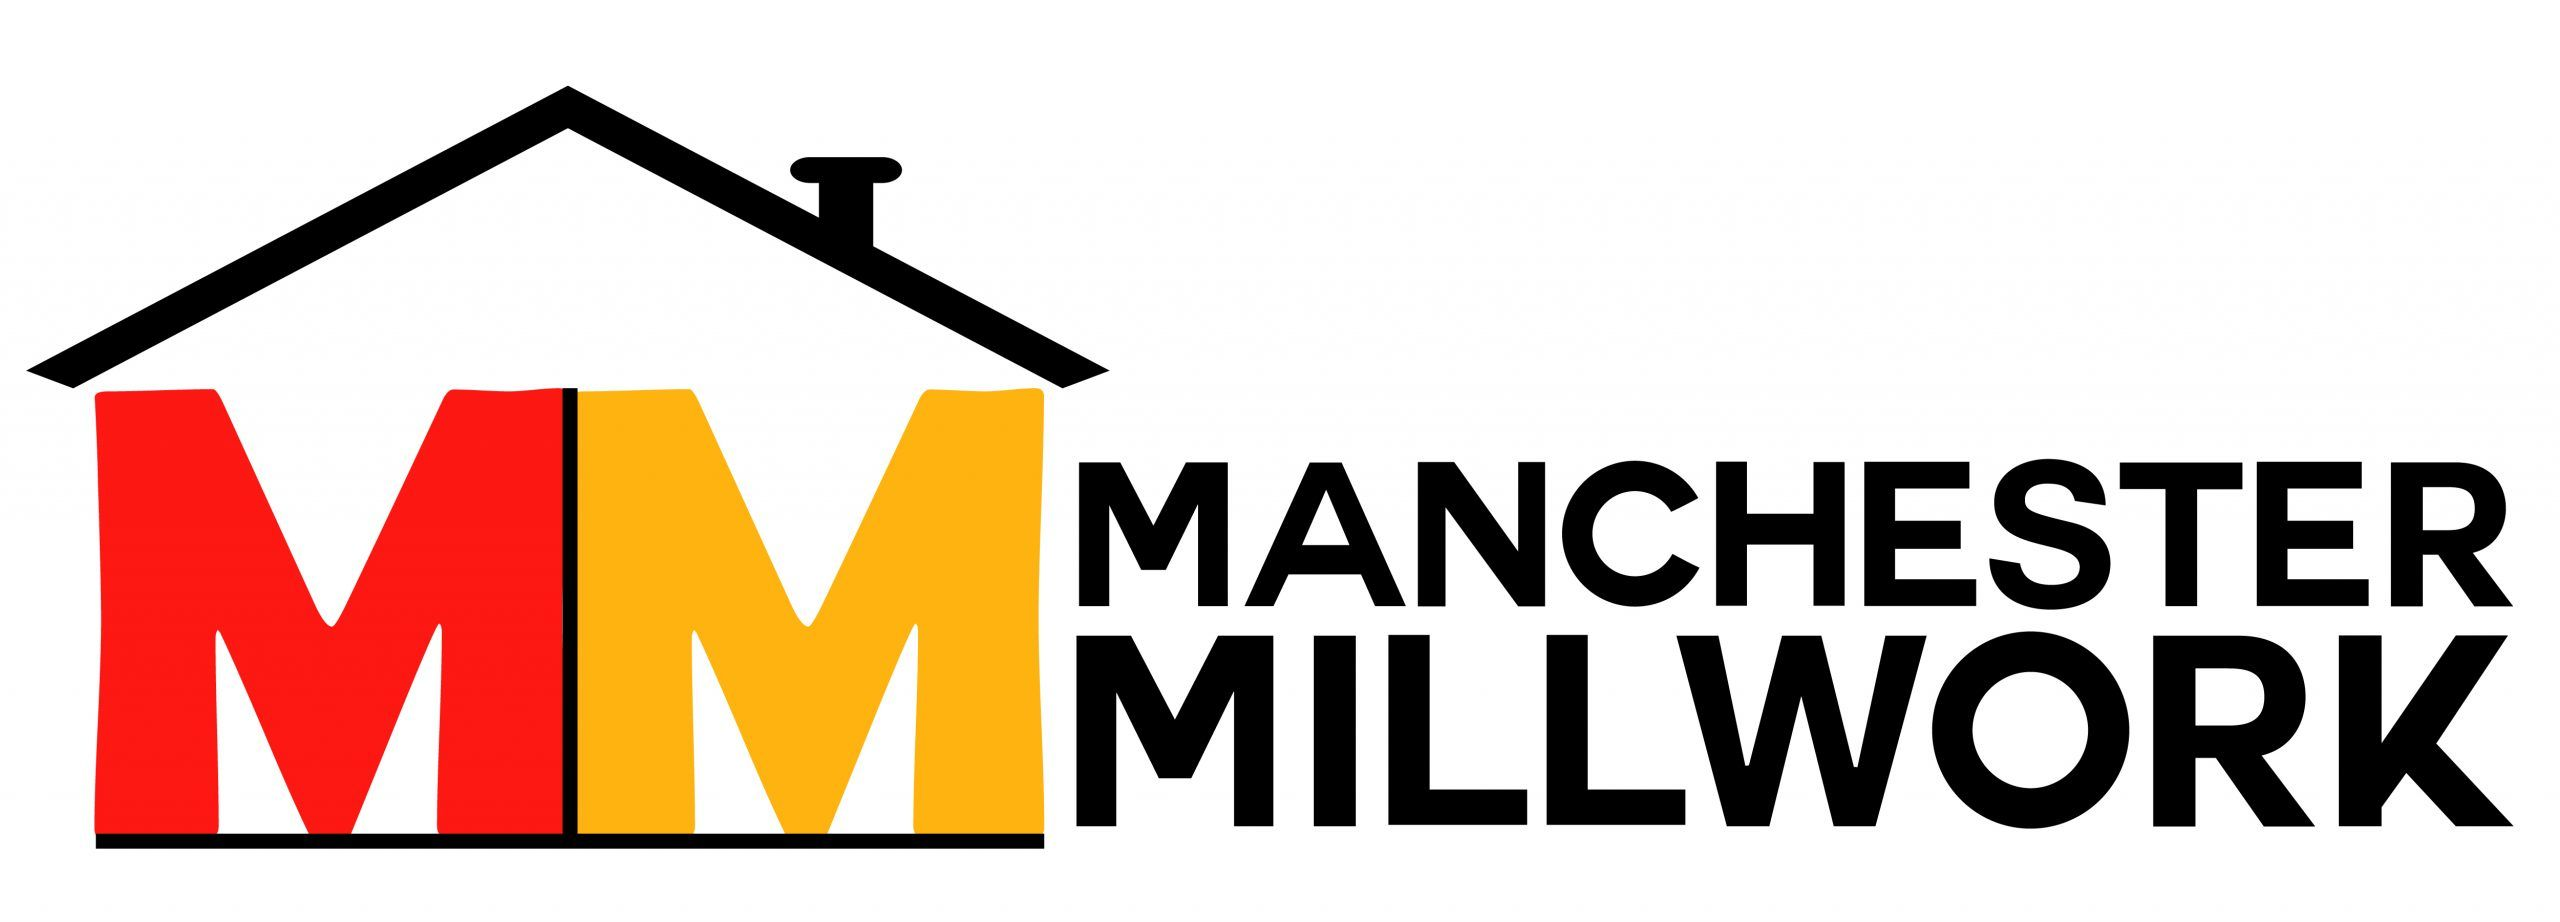 Manchester Millwork, Inc. Logo